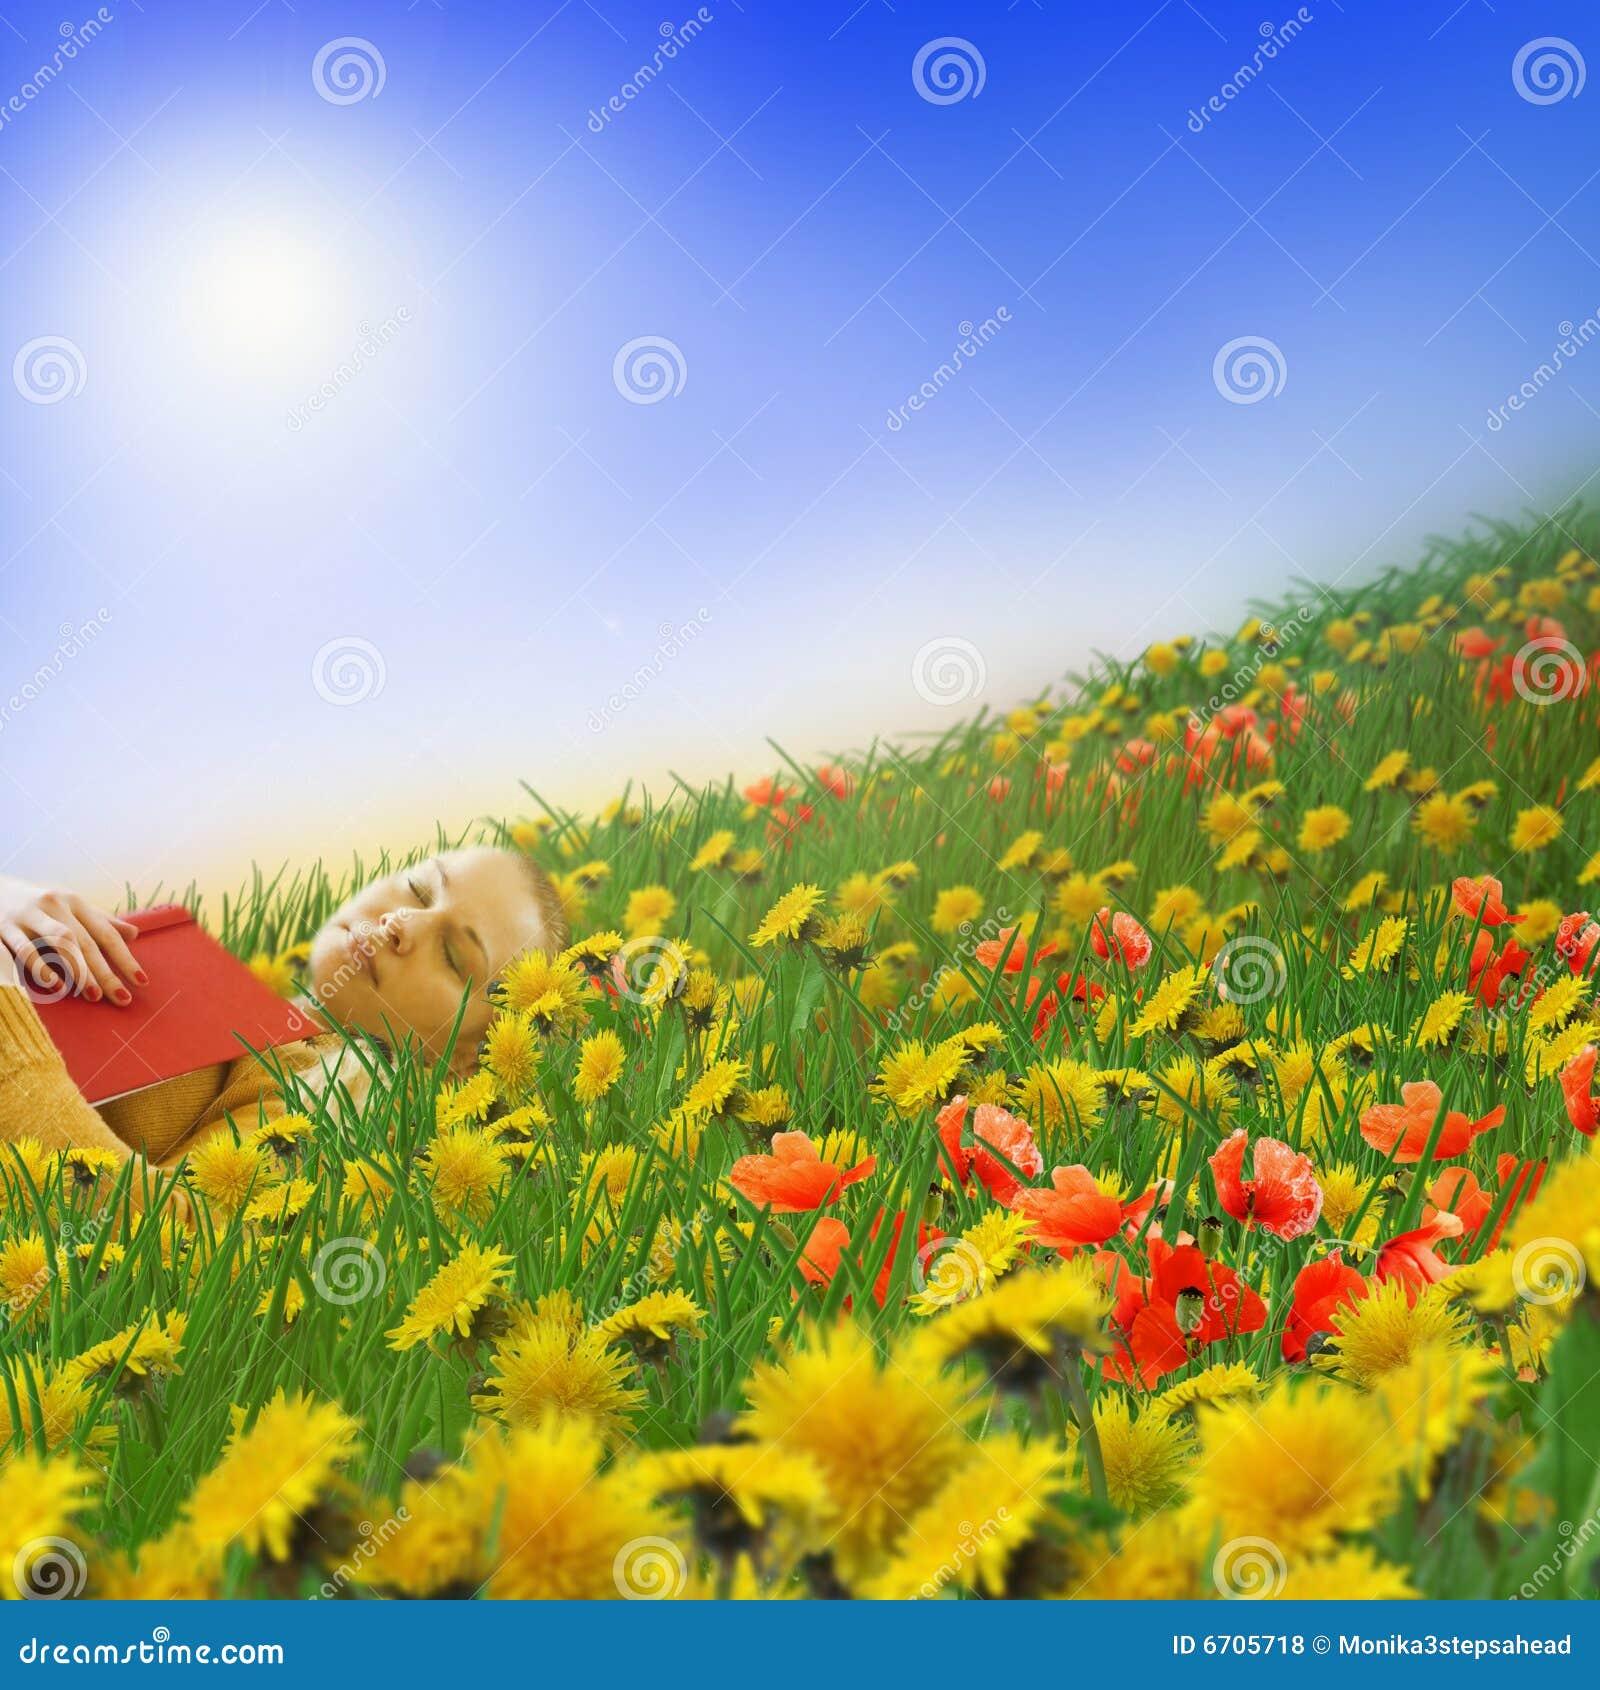 Woman sleeping on a meadow